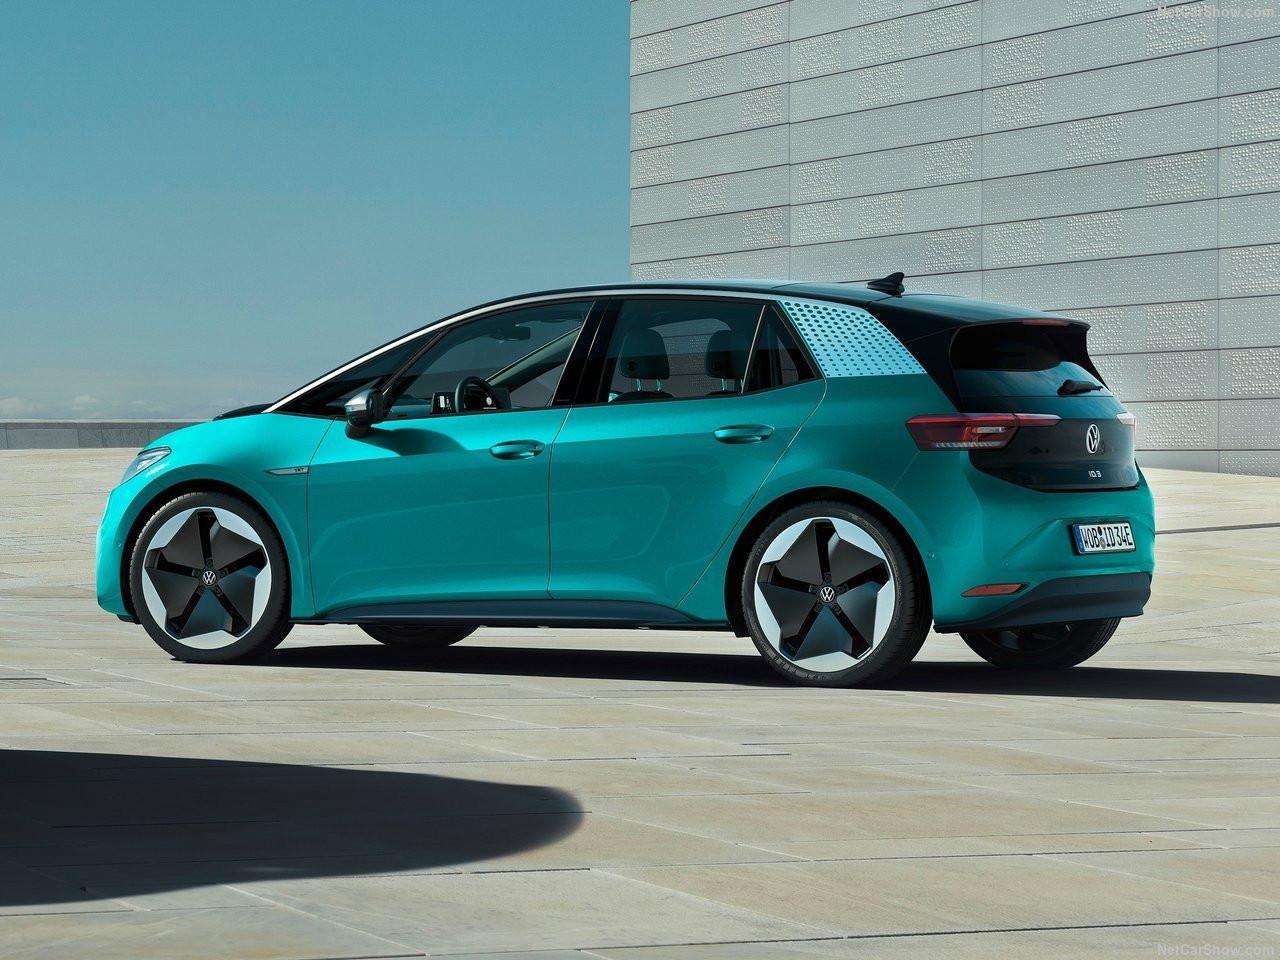 Volkswagen'in yeni otomobili örtüsünü kaldırdı: VW ID.3 1st Edition!